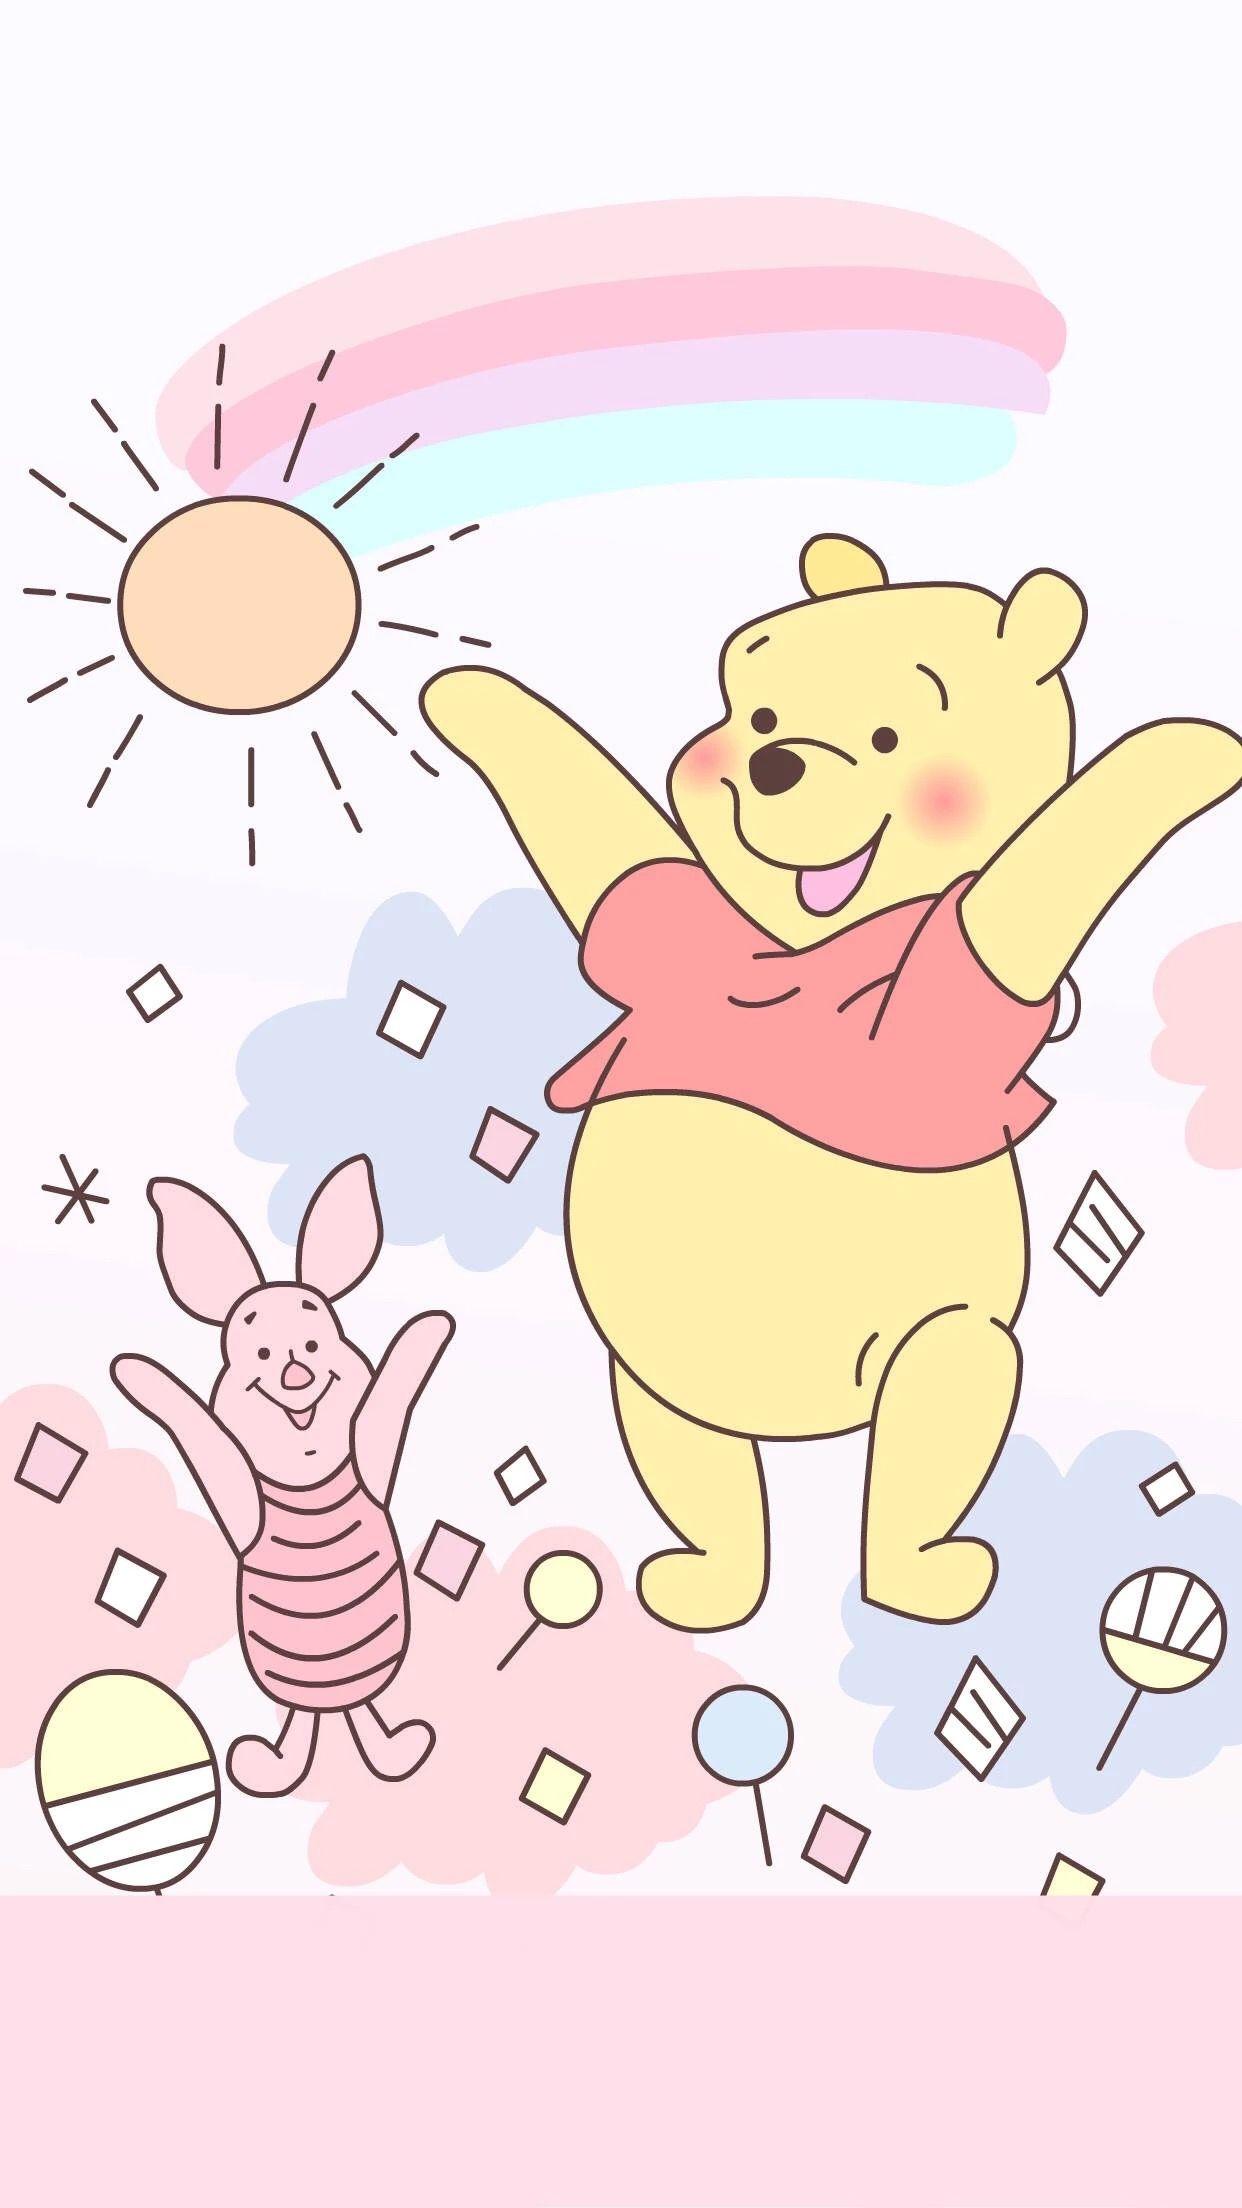 Pooh Bear & Piglet Homescreen | WINNIE THE POOH BEAR | Pinterest ...